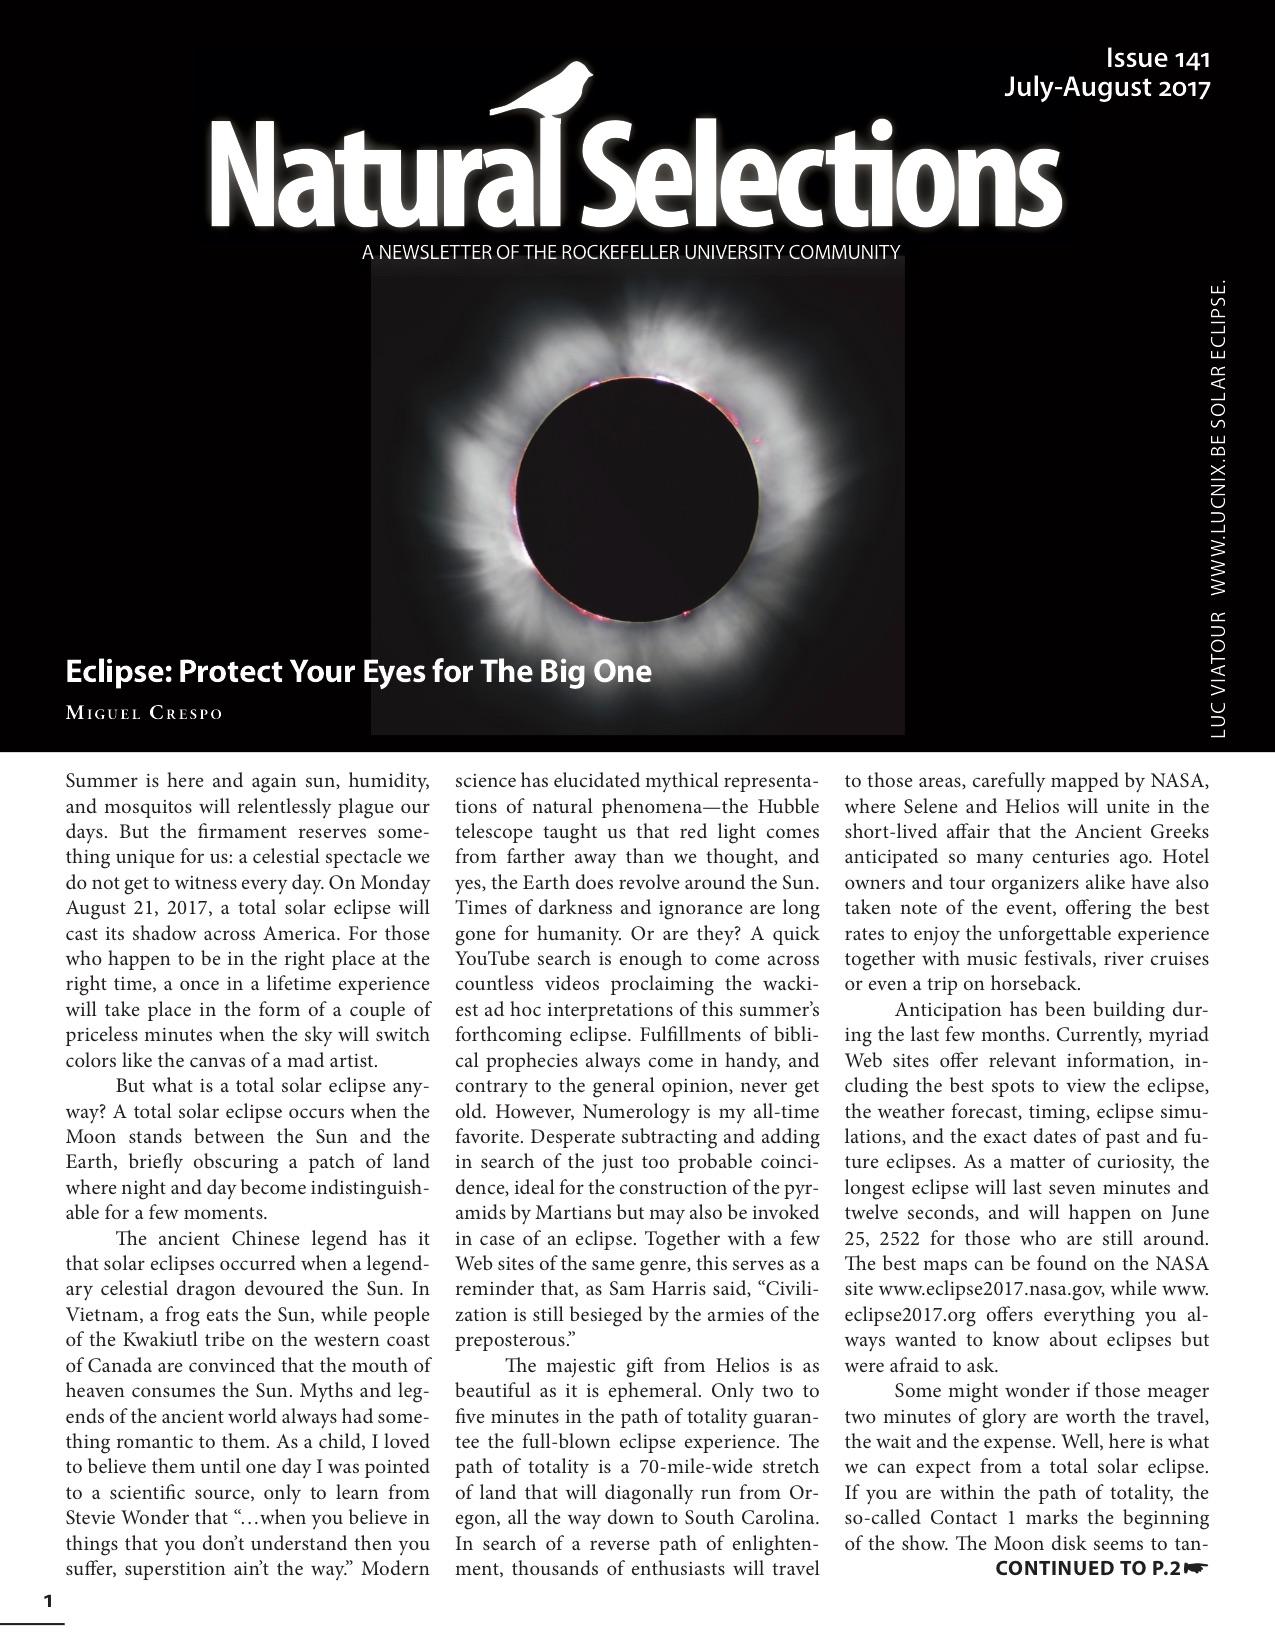 Juliette Wipf | Natural Selections